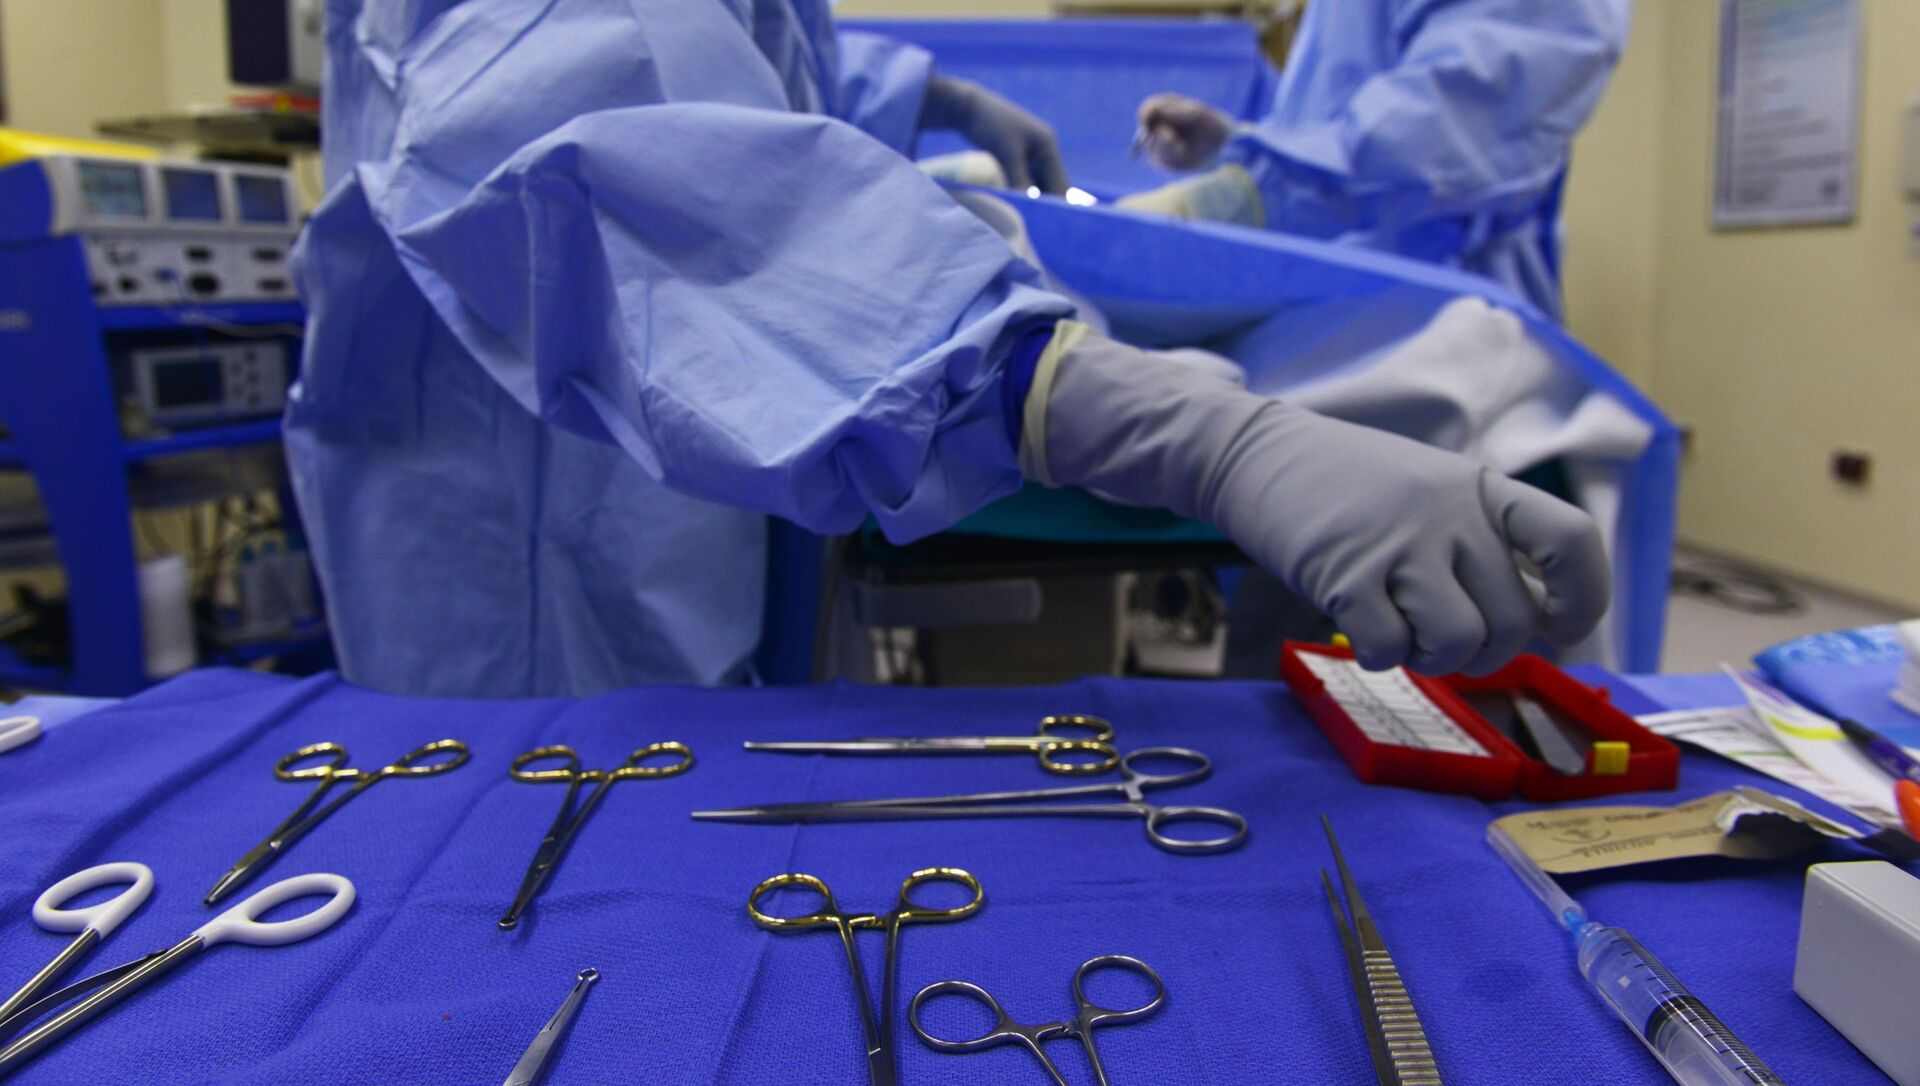 Surgical instruments in the operating room - Sputnik International, 1920, 23.07.2021